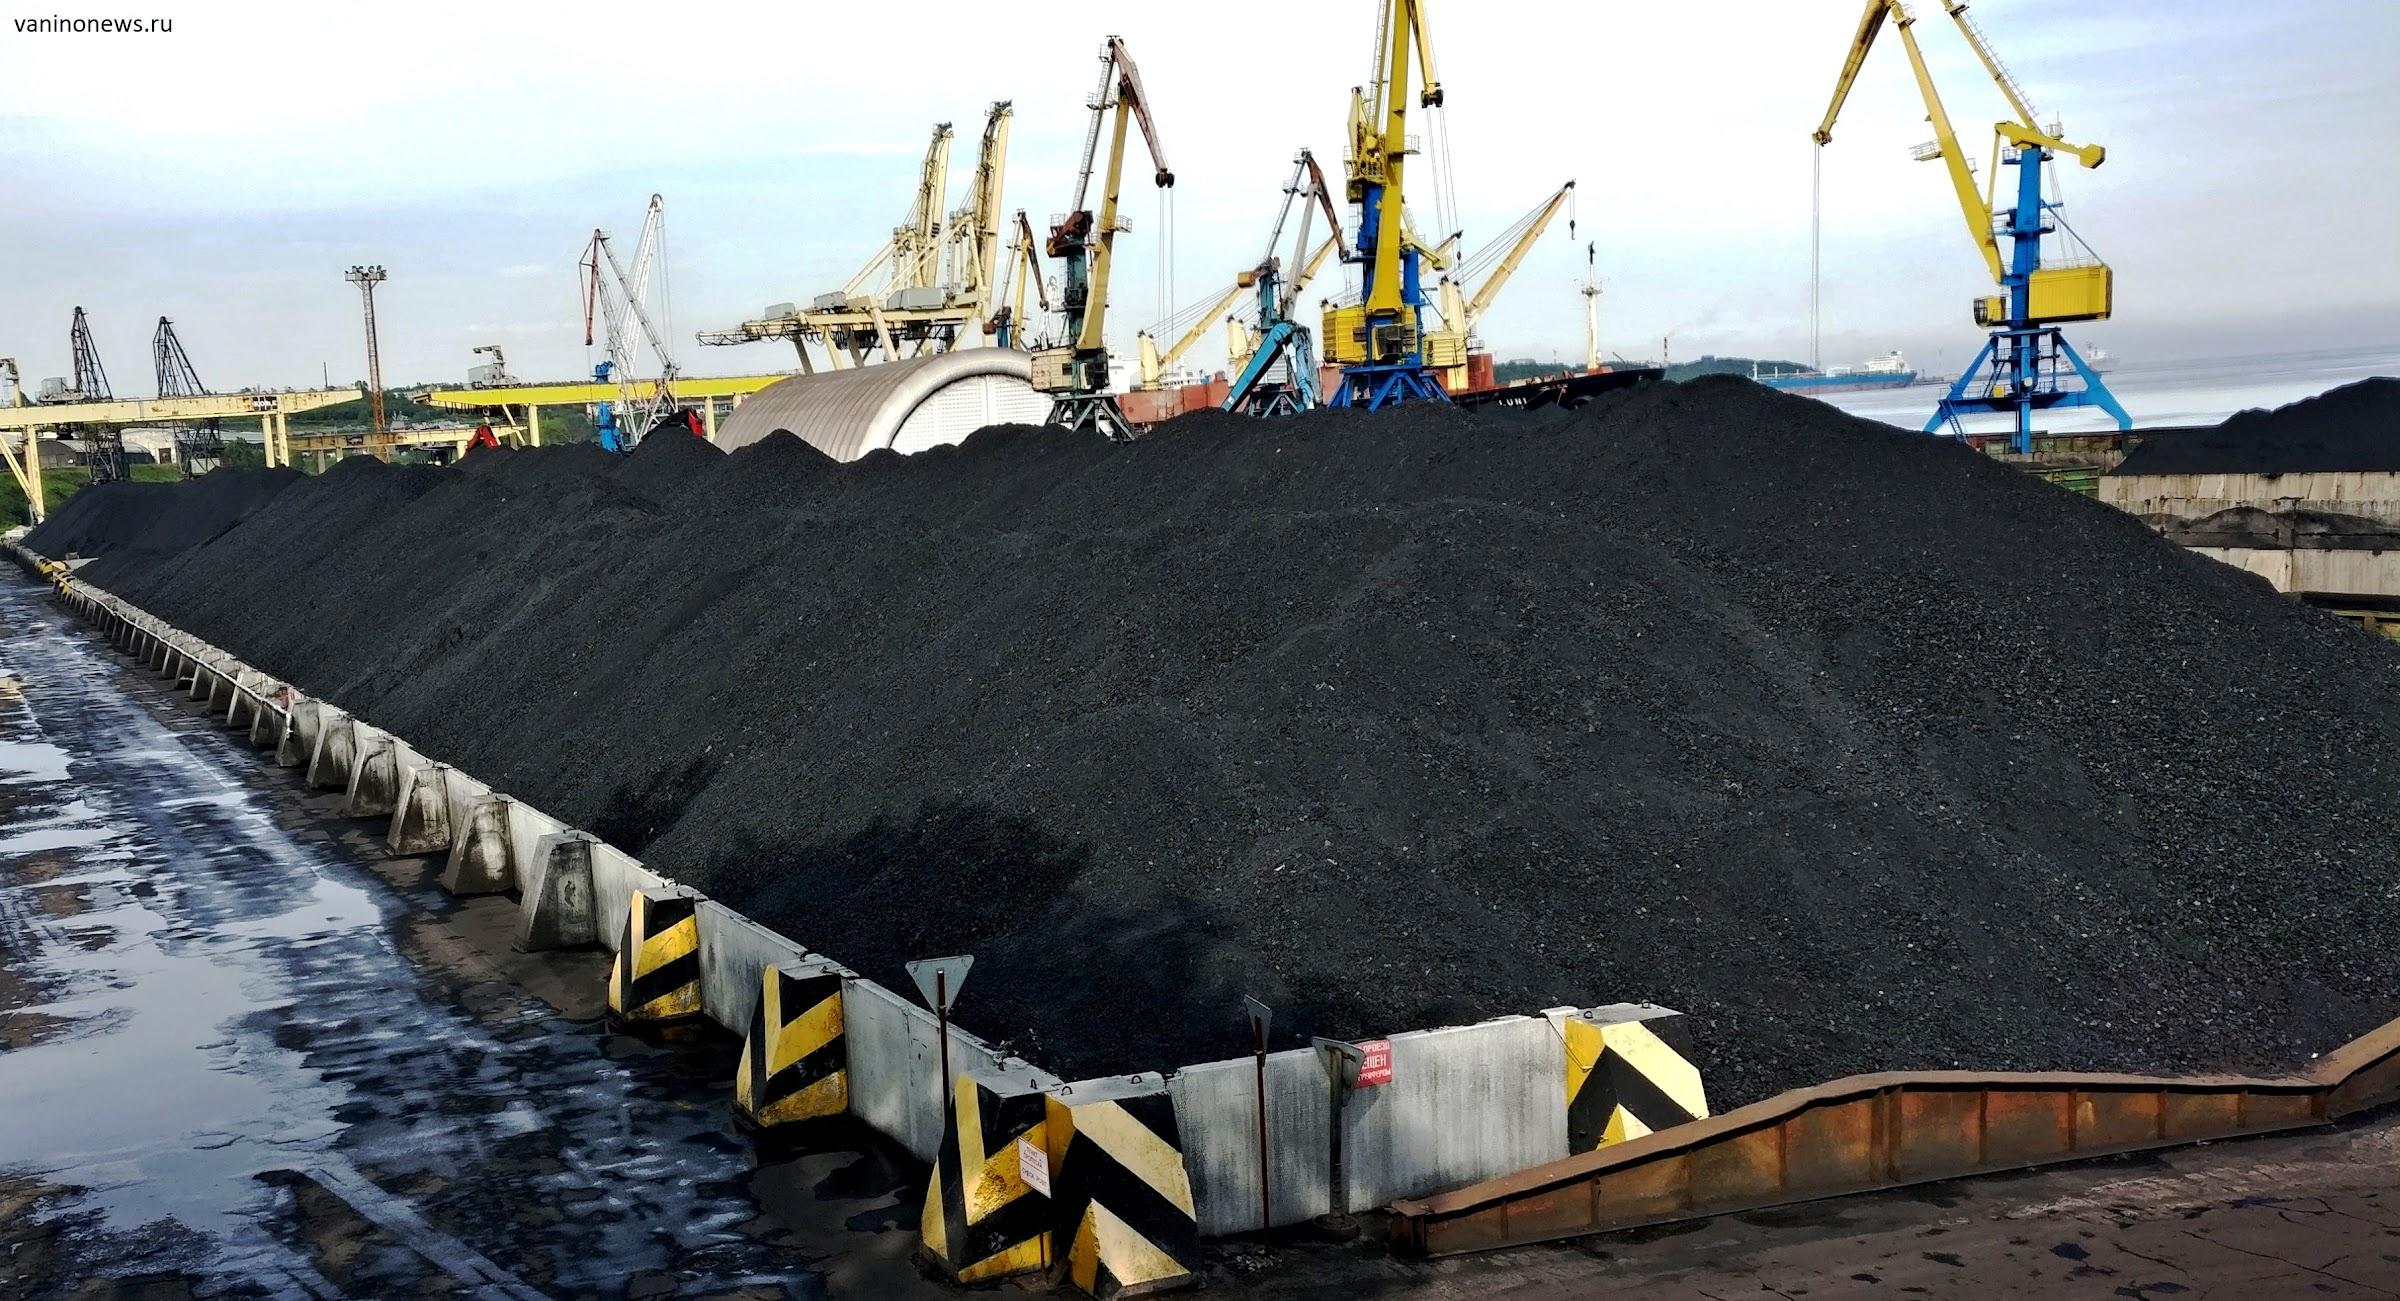 Новости Ванино vaninonews.ru - Порт Ванино, перевалка угля «под куполом»